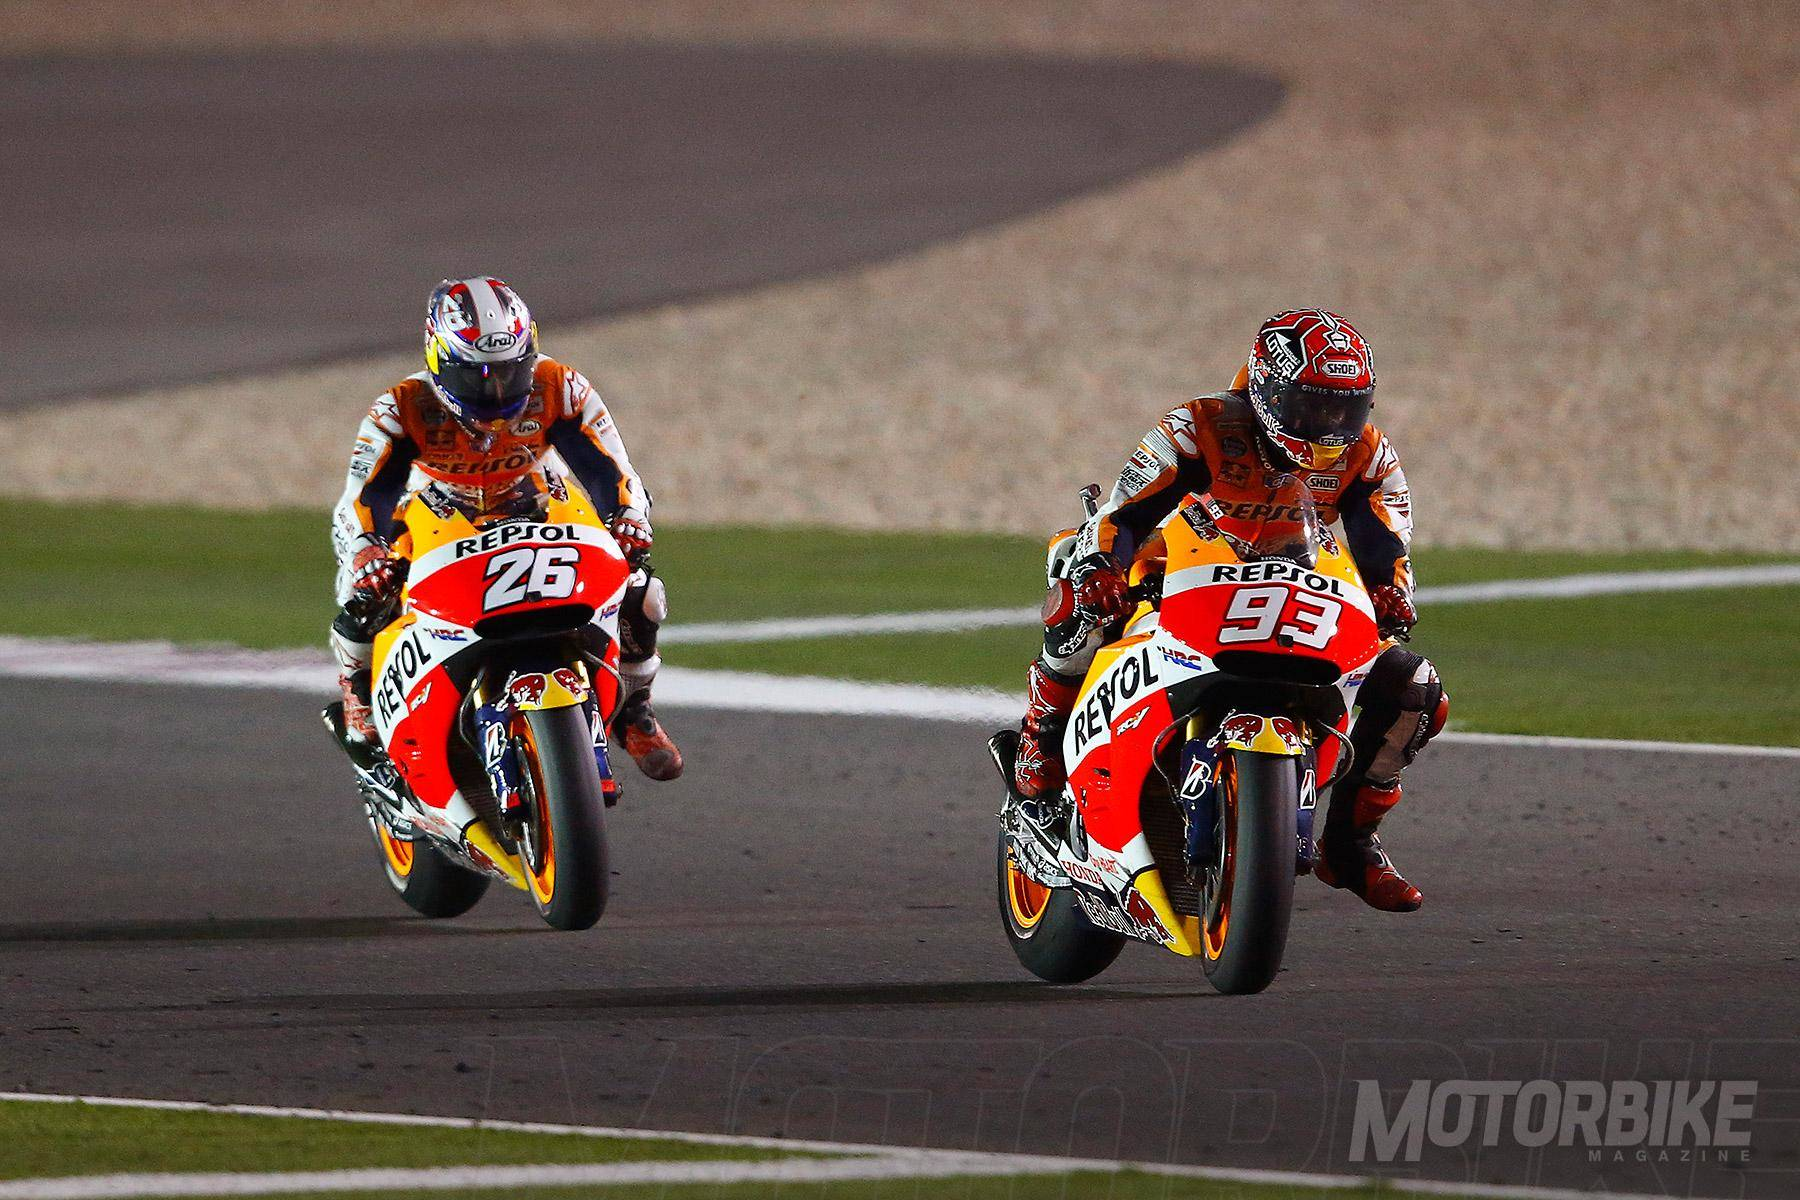 GP de Qatar 2015MotoGPMarc Márquez